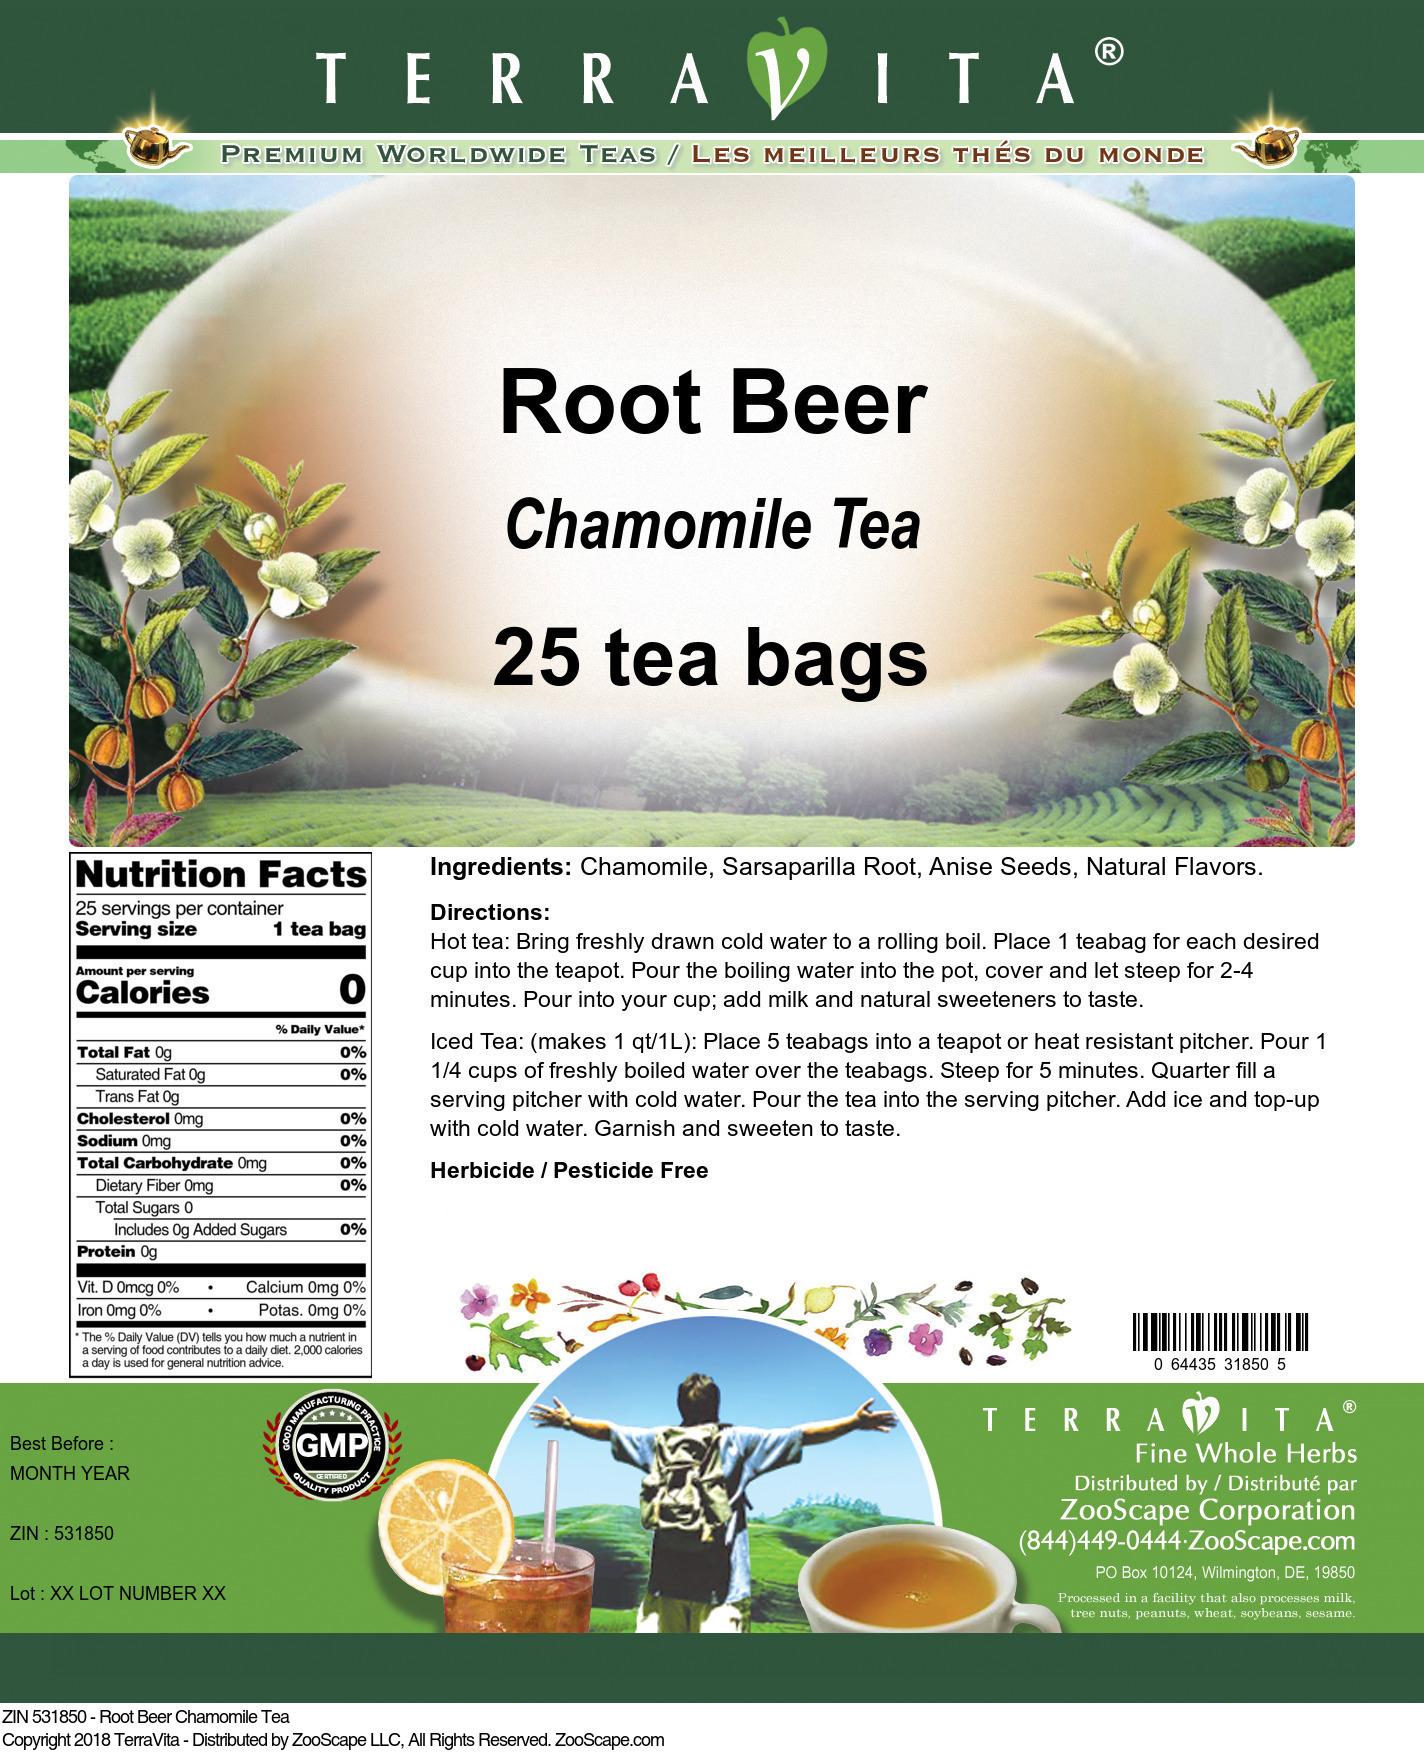 Root Beer Chamomile Tea